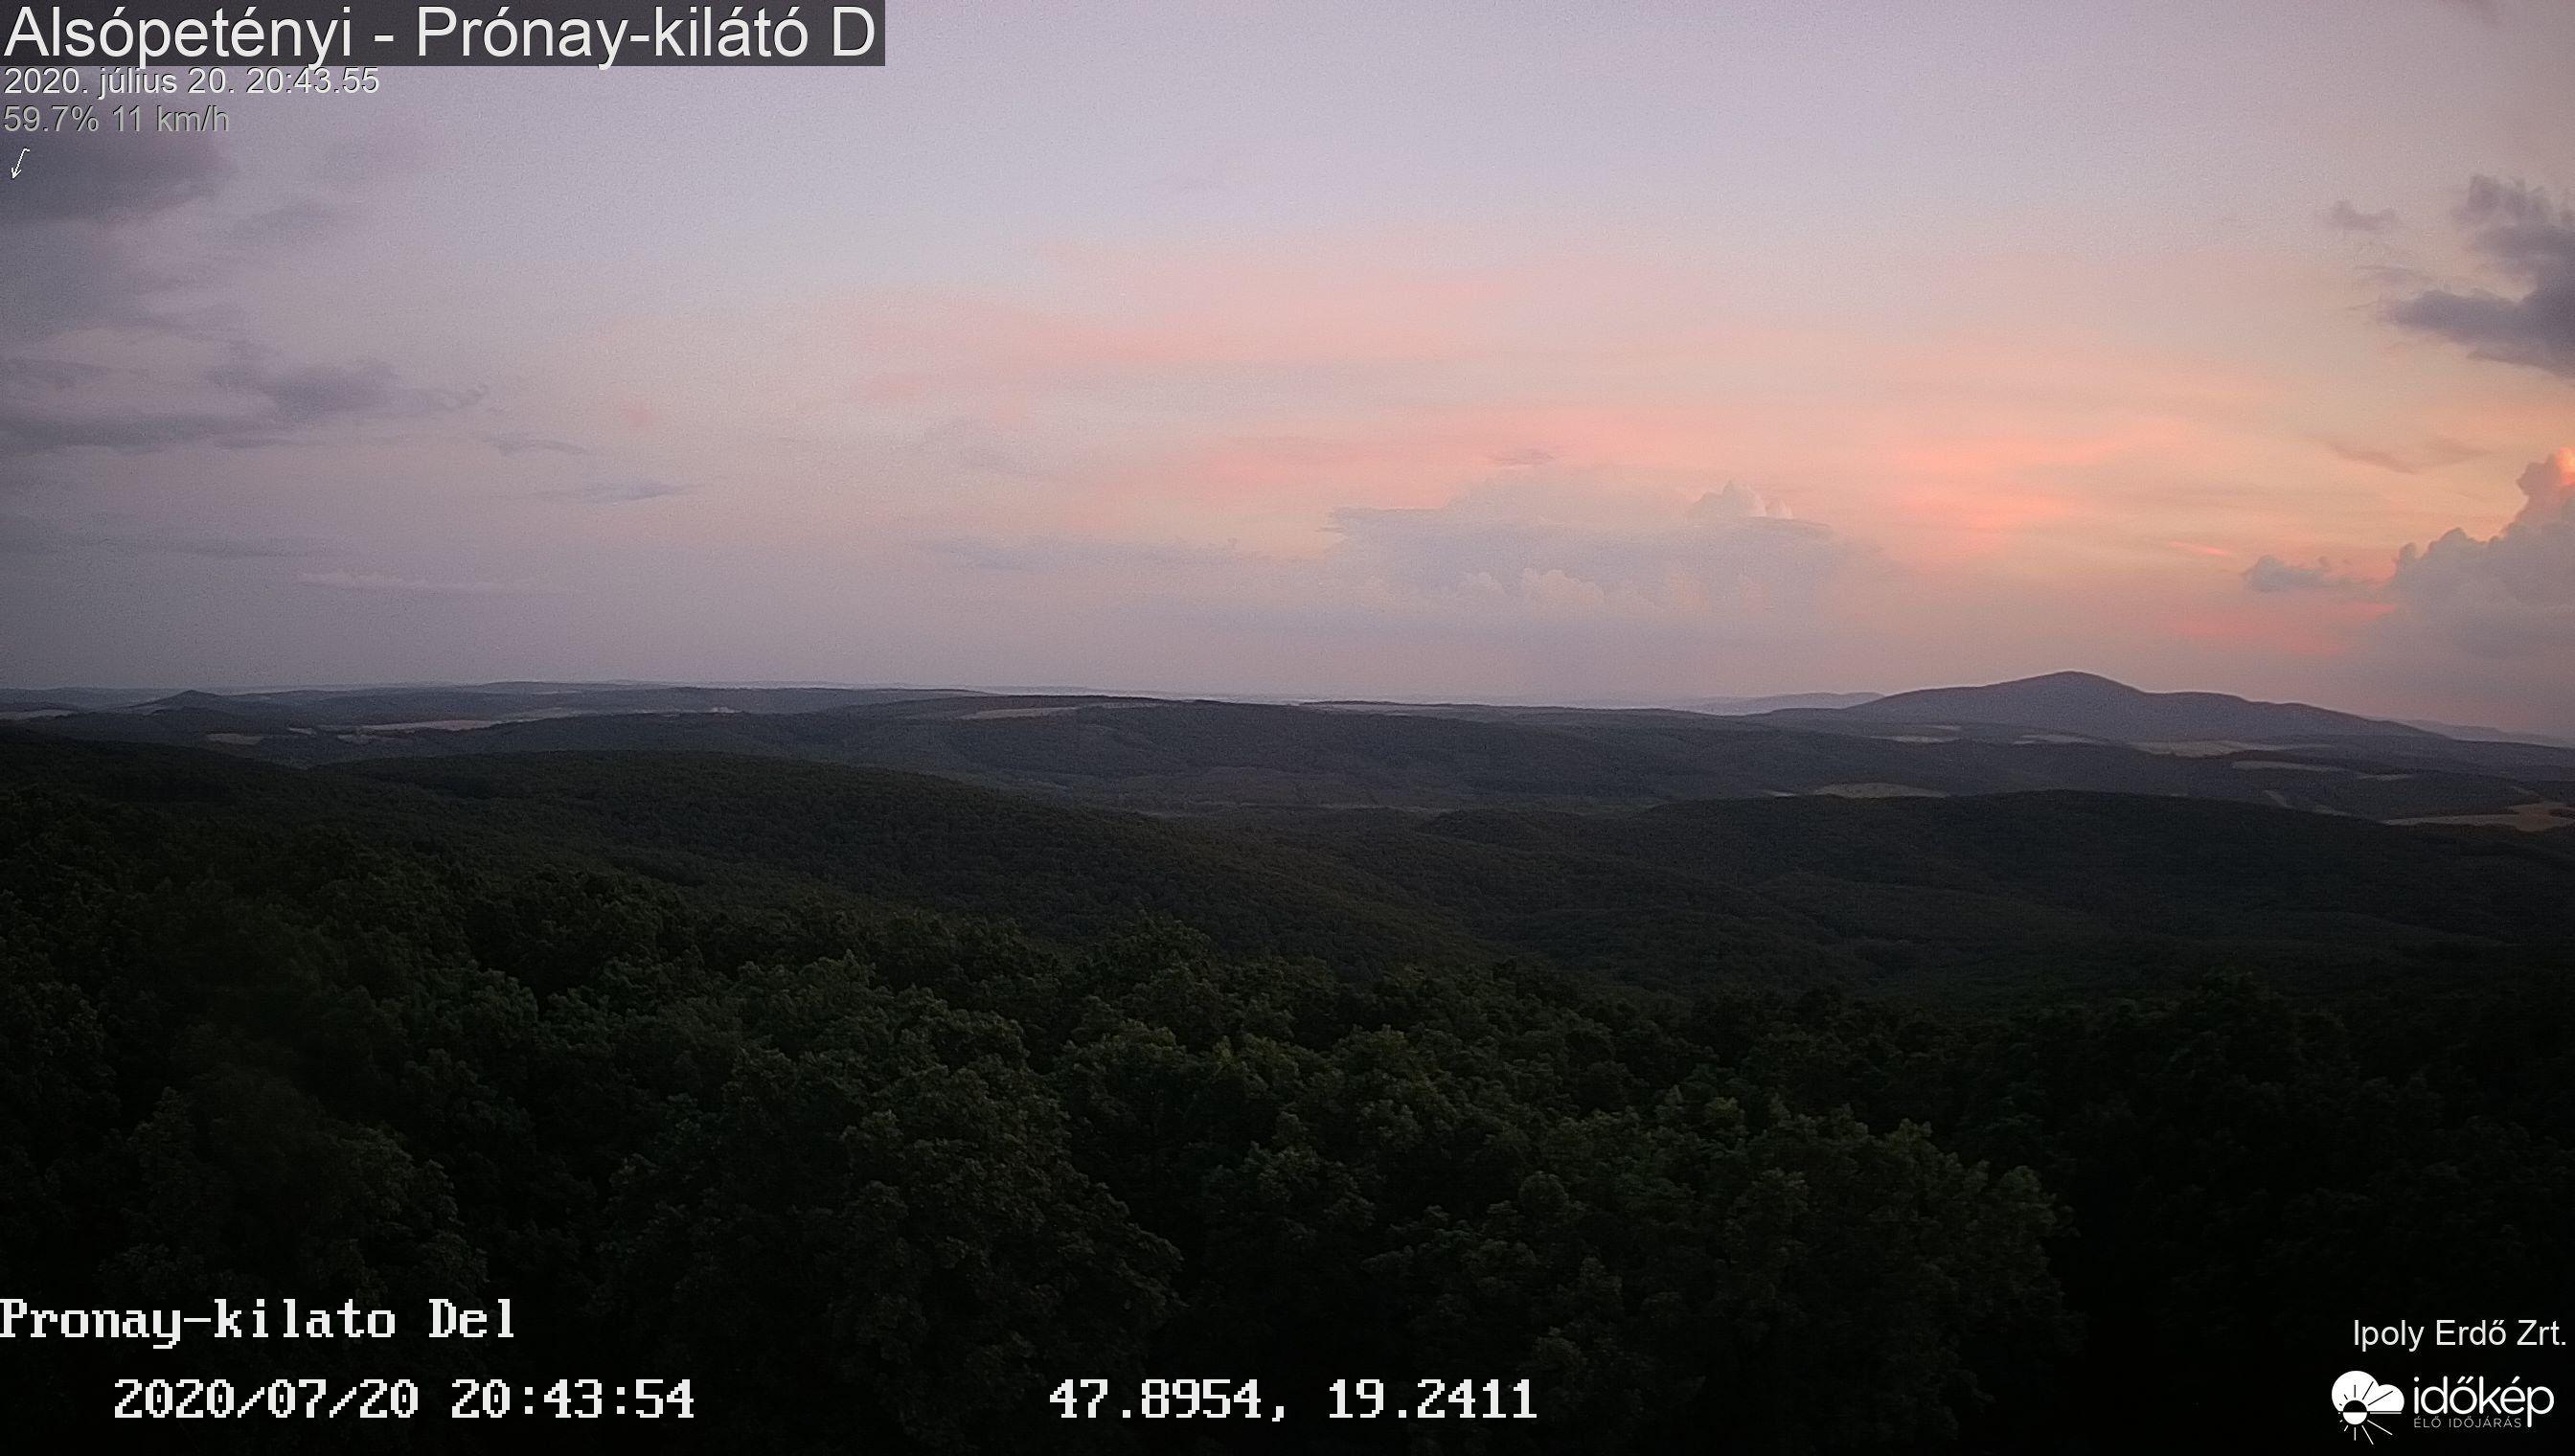 Alsopetenyi Pronay Kilato D Webkamera Natural Landmarks Landmarks Outdoor